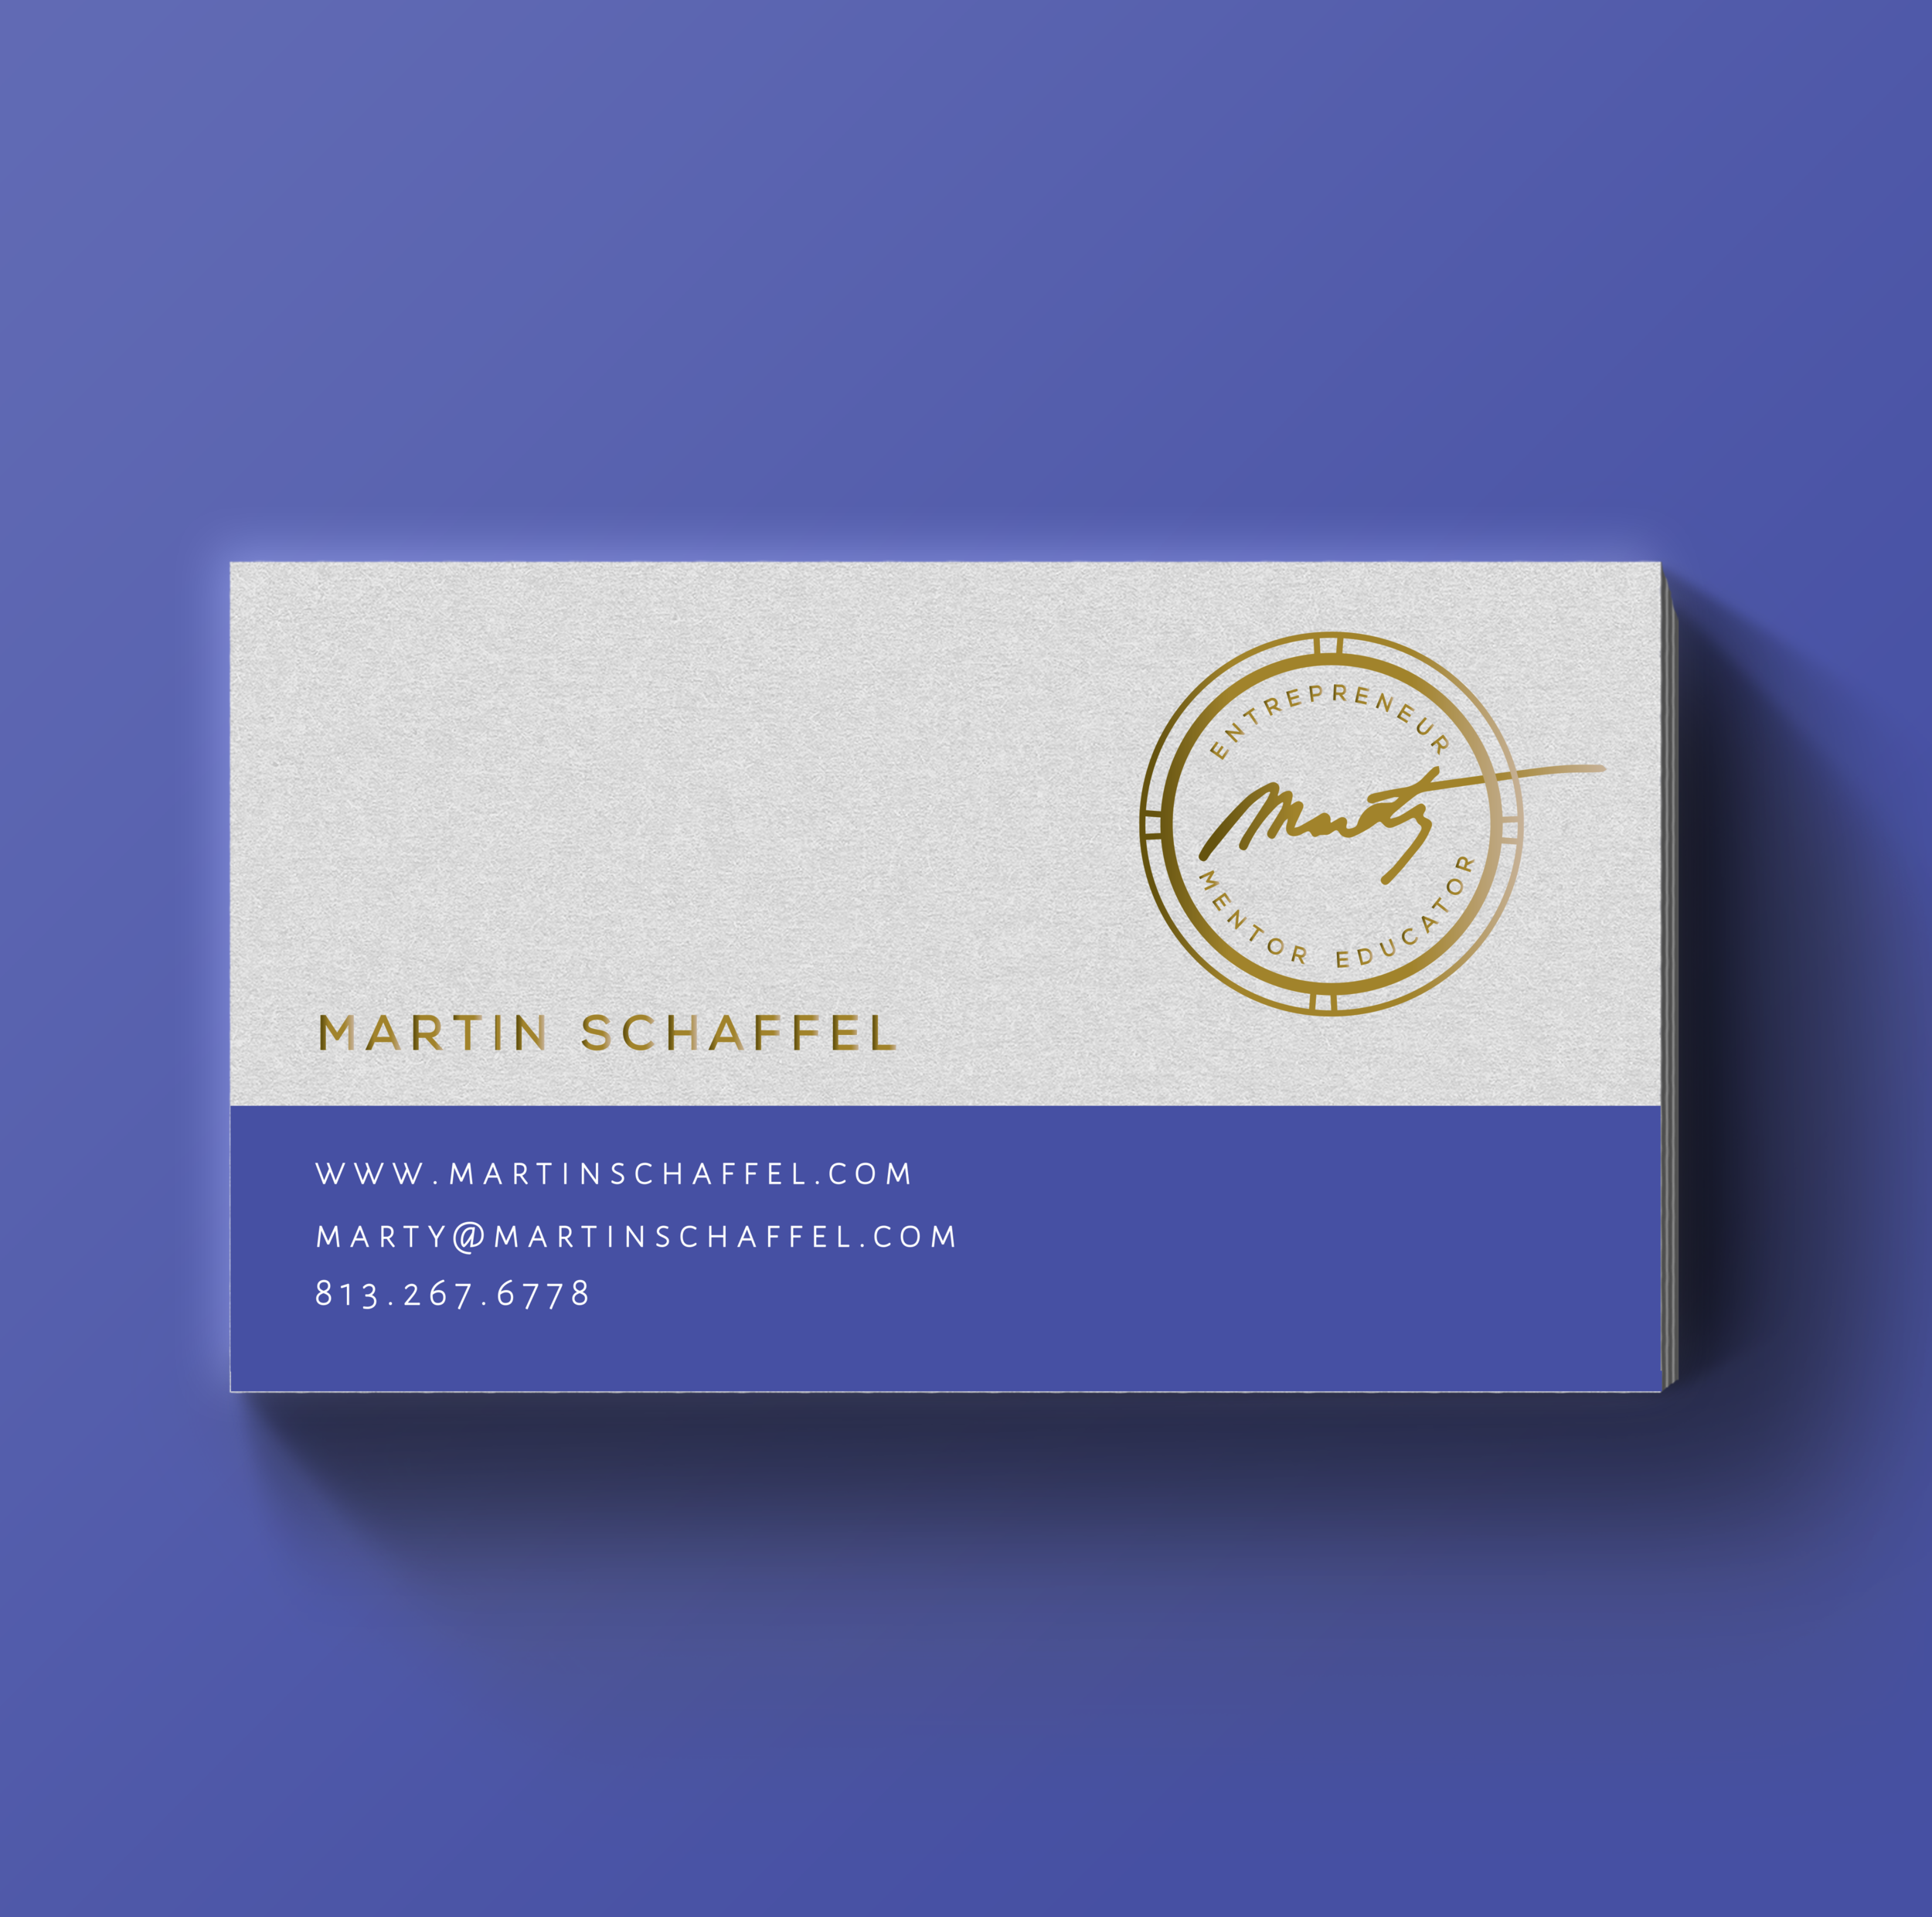 Business Card Design - Moo Gold Foil